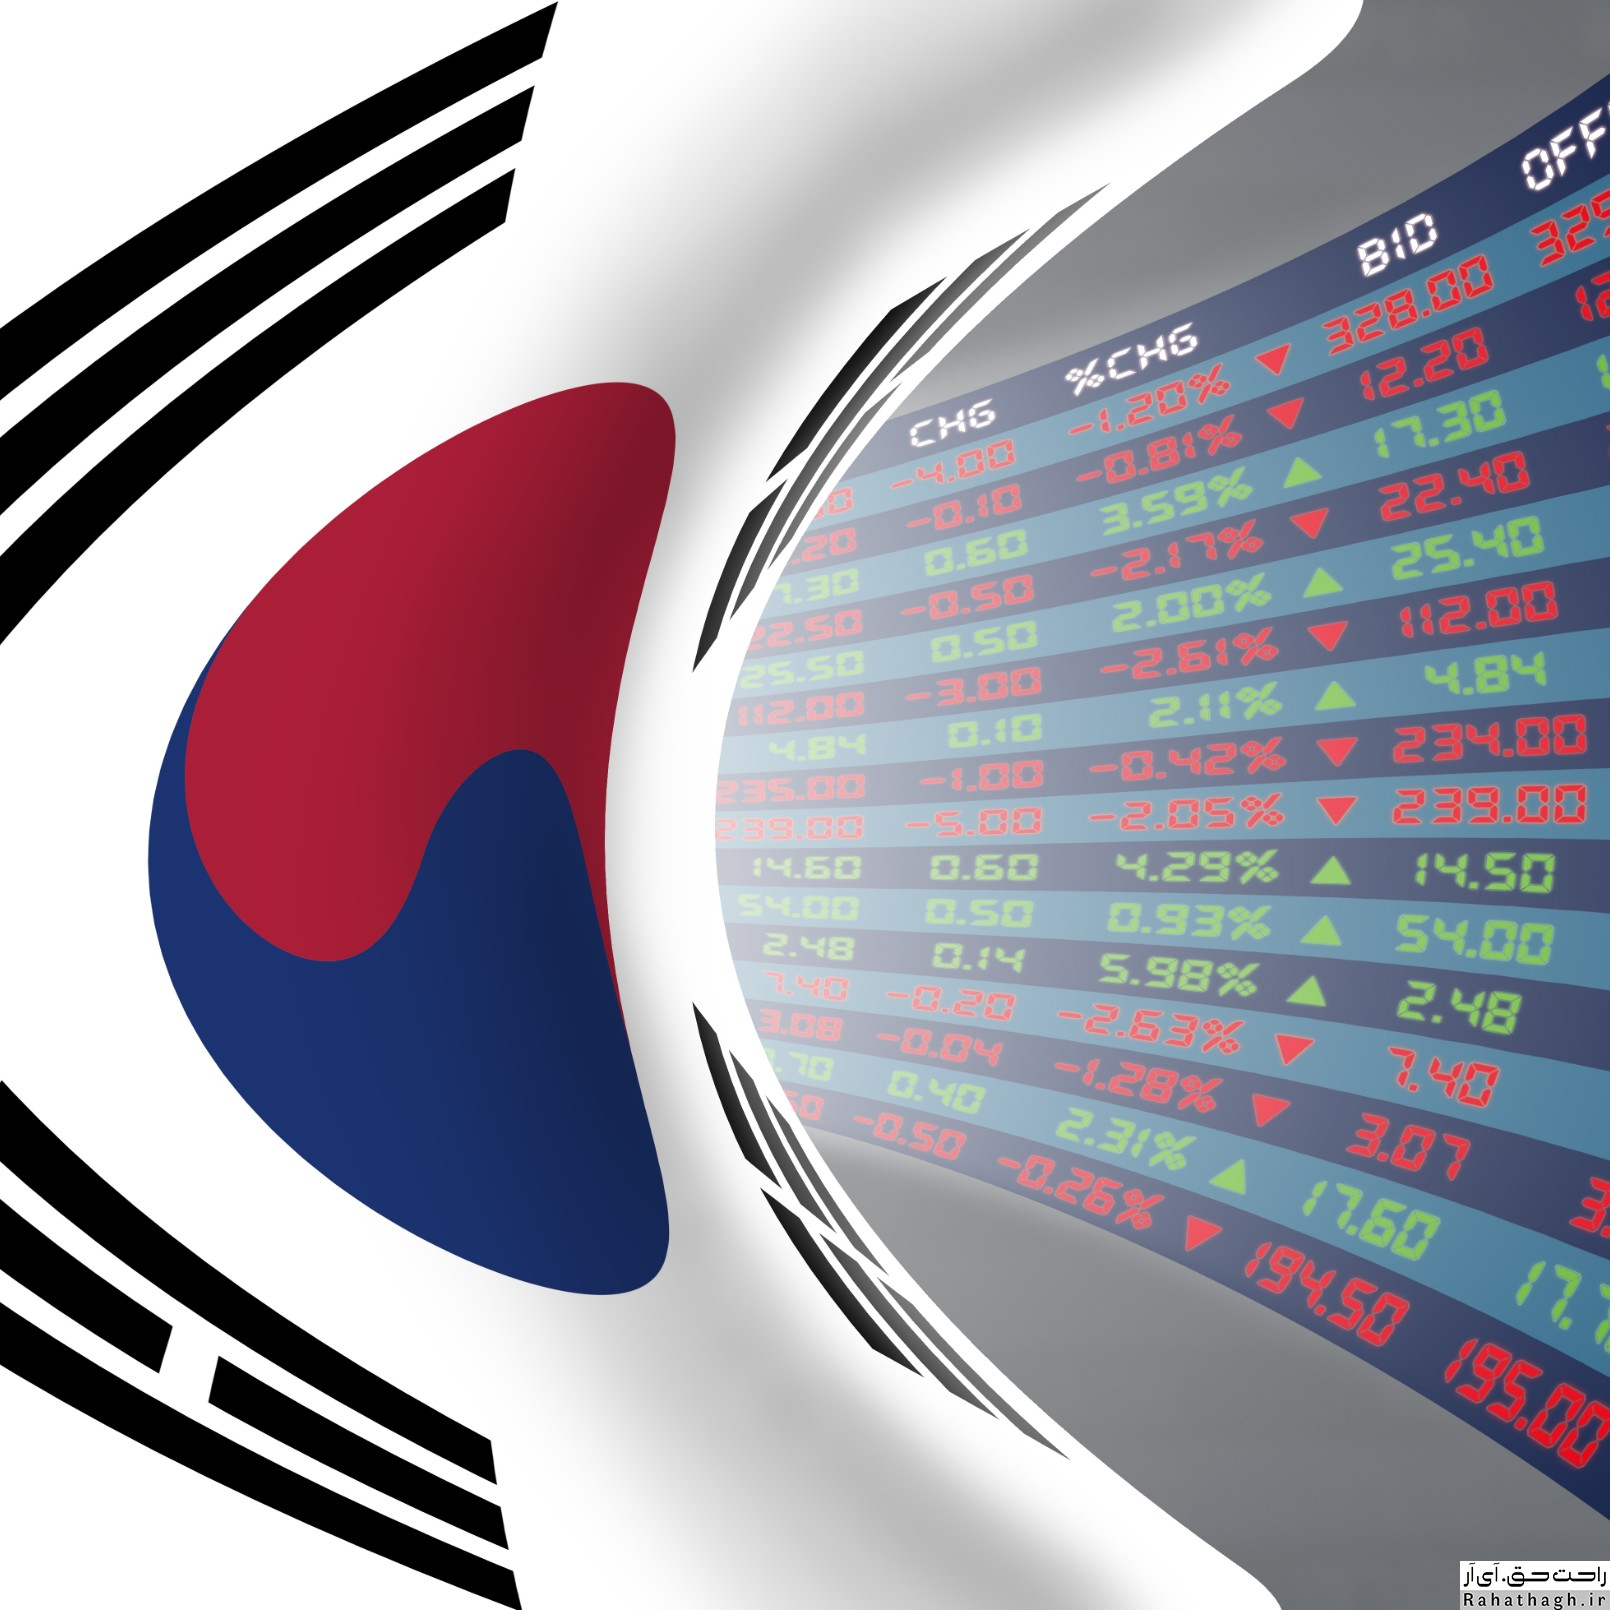 https://bayanbox.ir/view/2342736855892758043/korean-cryptocurrency-%D8%B1%D8%A7%D8%AD%D8%AA-%D8%AD%D9%82.jpg